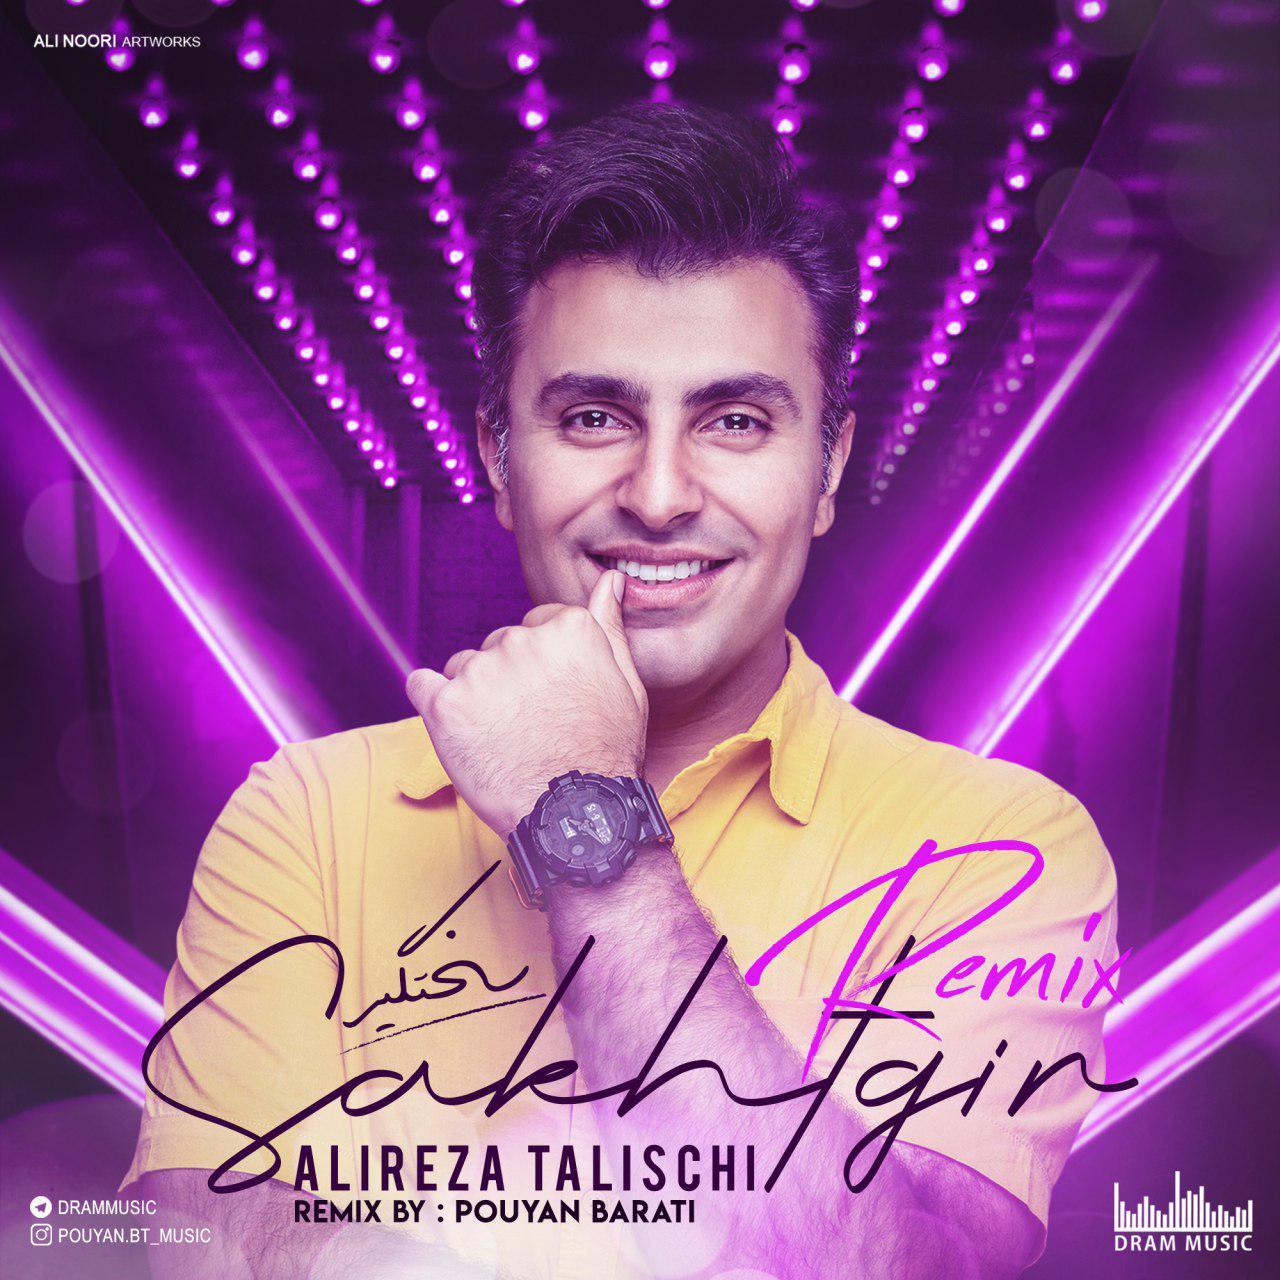 Alireza Talischi – Sakhtgir (Pouyan Barati Remix)